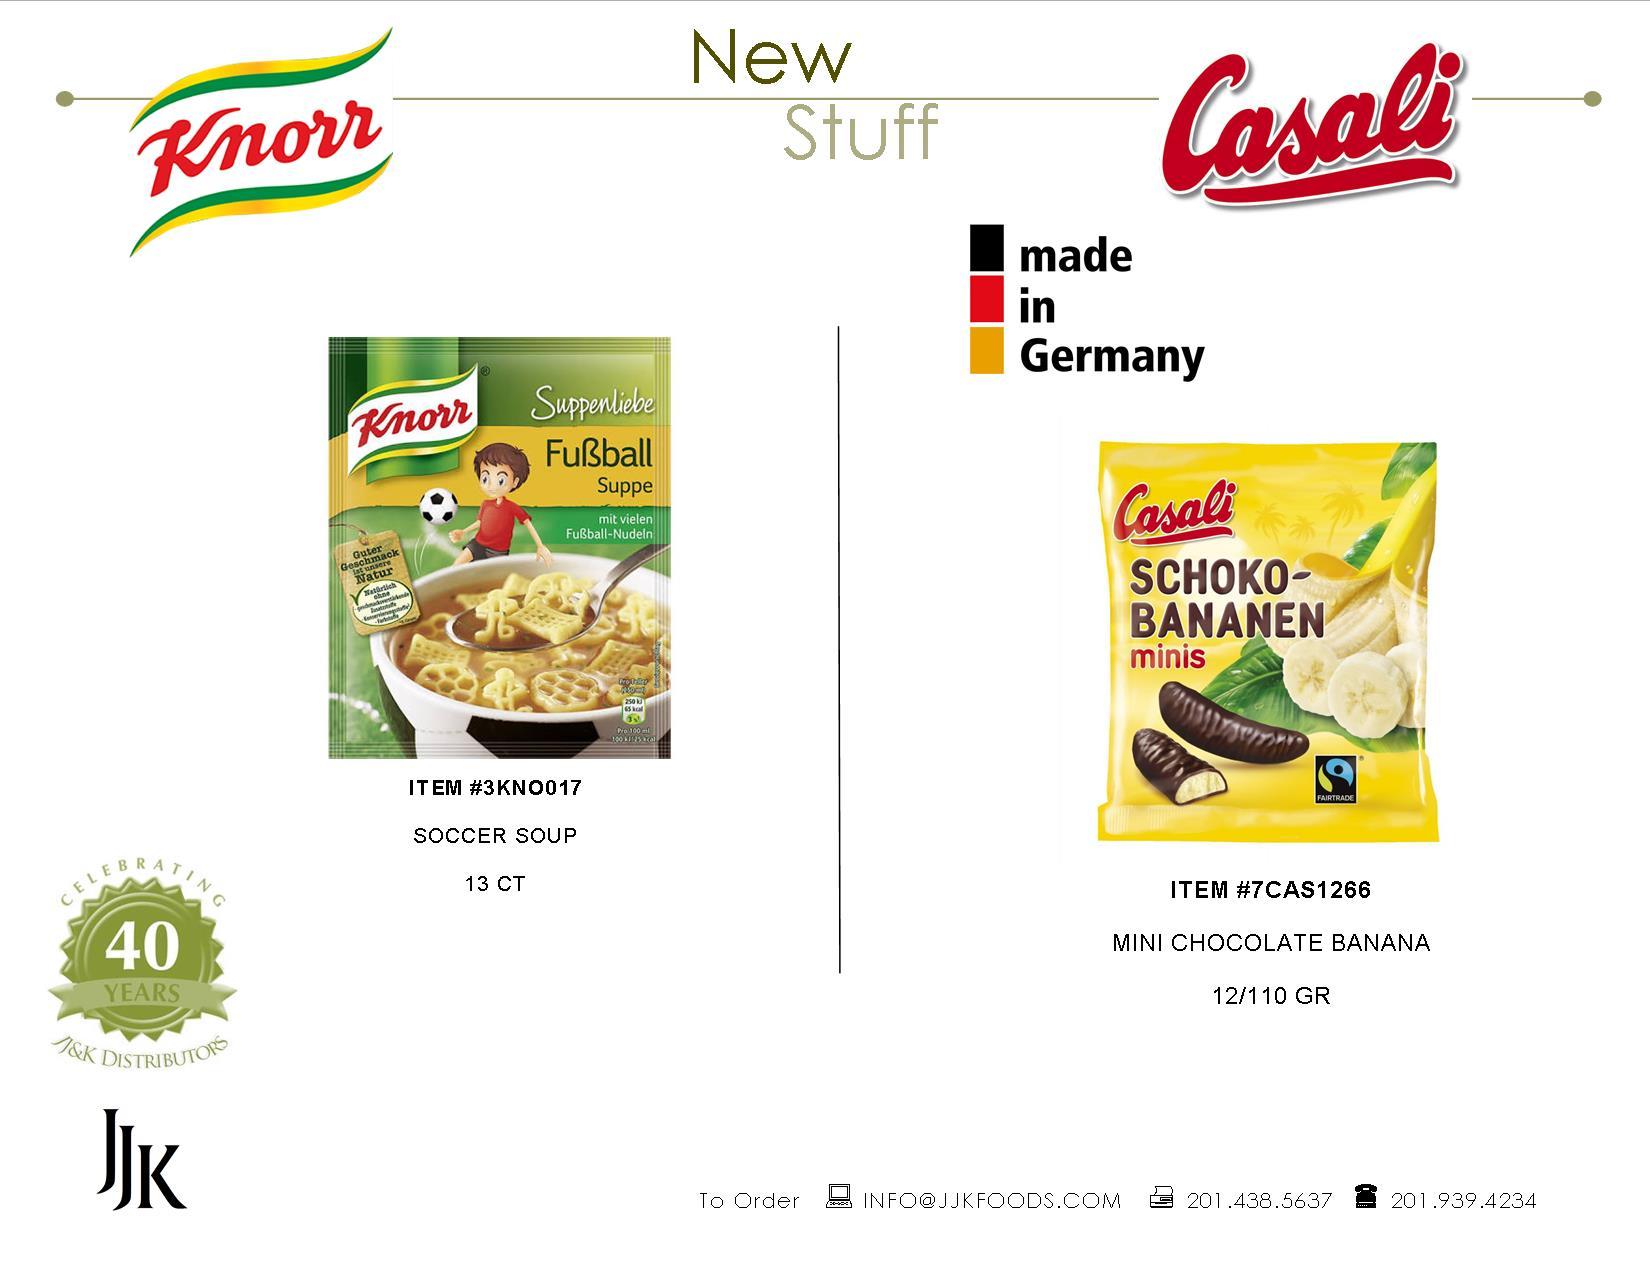 JJ&K Distributors, German Food, Distributor, Wholesale, JJK